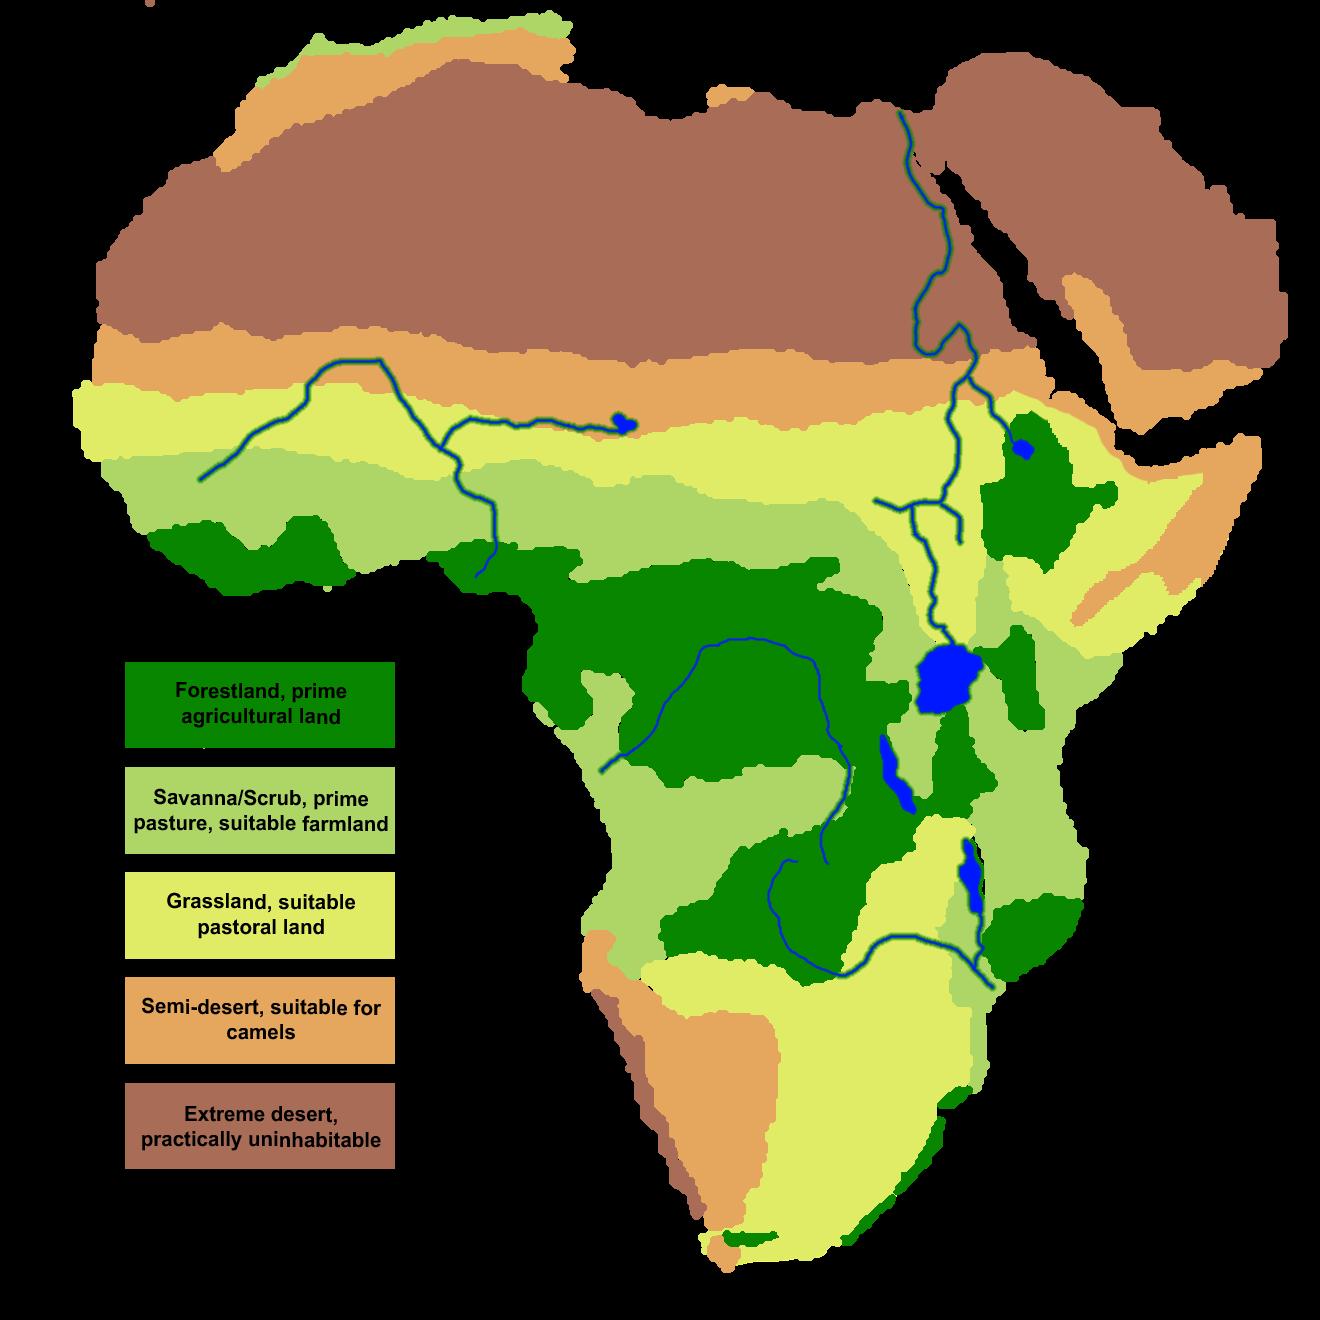 Social Stus with Ms. Rainey: The Kingdom of Ghana on kingdom of netherlands, kingdom of ashanti, songhai kingdom map, benin kingdom map, nok empire map, kingdom of dahomey, kingdom of nubia, kingdom of songhai, zimbabwe map, karakura town map, kingdom of gwynedd, kingdom of benin, ashanti kingdom map, kingdom of morocco, gold trade map, kingdom of franks, kingdom of poland, kingdom of axum, bantu empire map, cote d'ivoire africa map,